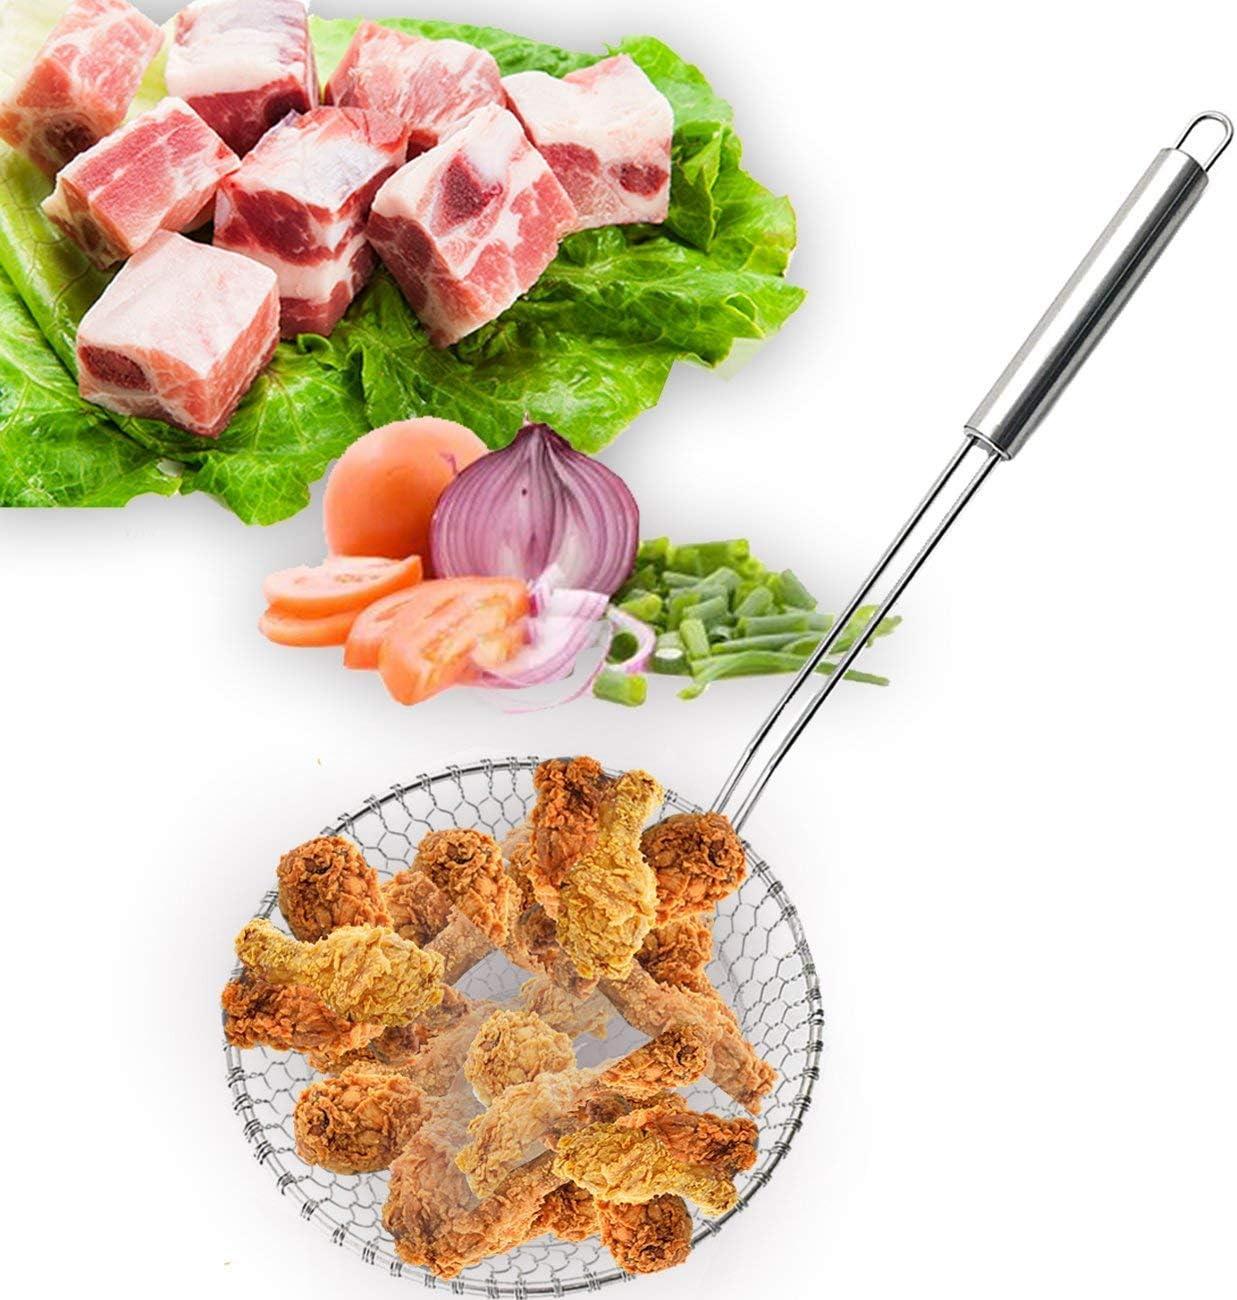 Home Servz Stainless Steel Asian Spider Strainer Kitchen Skimmer-Durable Handle/& Spiral Mesh Basket-Spaghetti,Noodle,Ravioli,Wok,Cooking Filter,Food Strainers,Fat Separator 5-Inch Strainer Basket